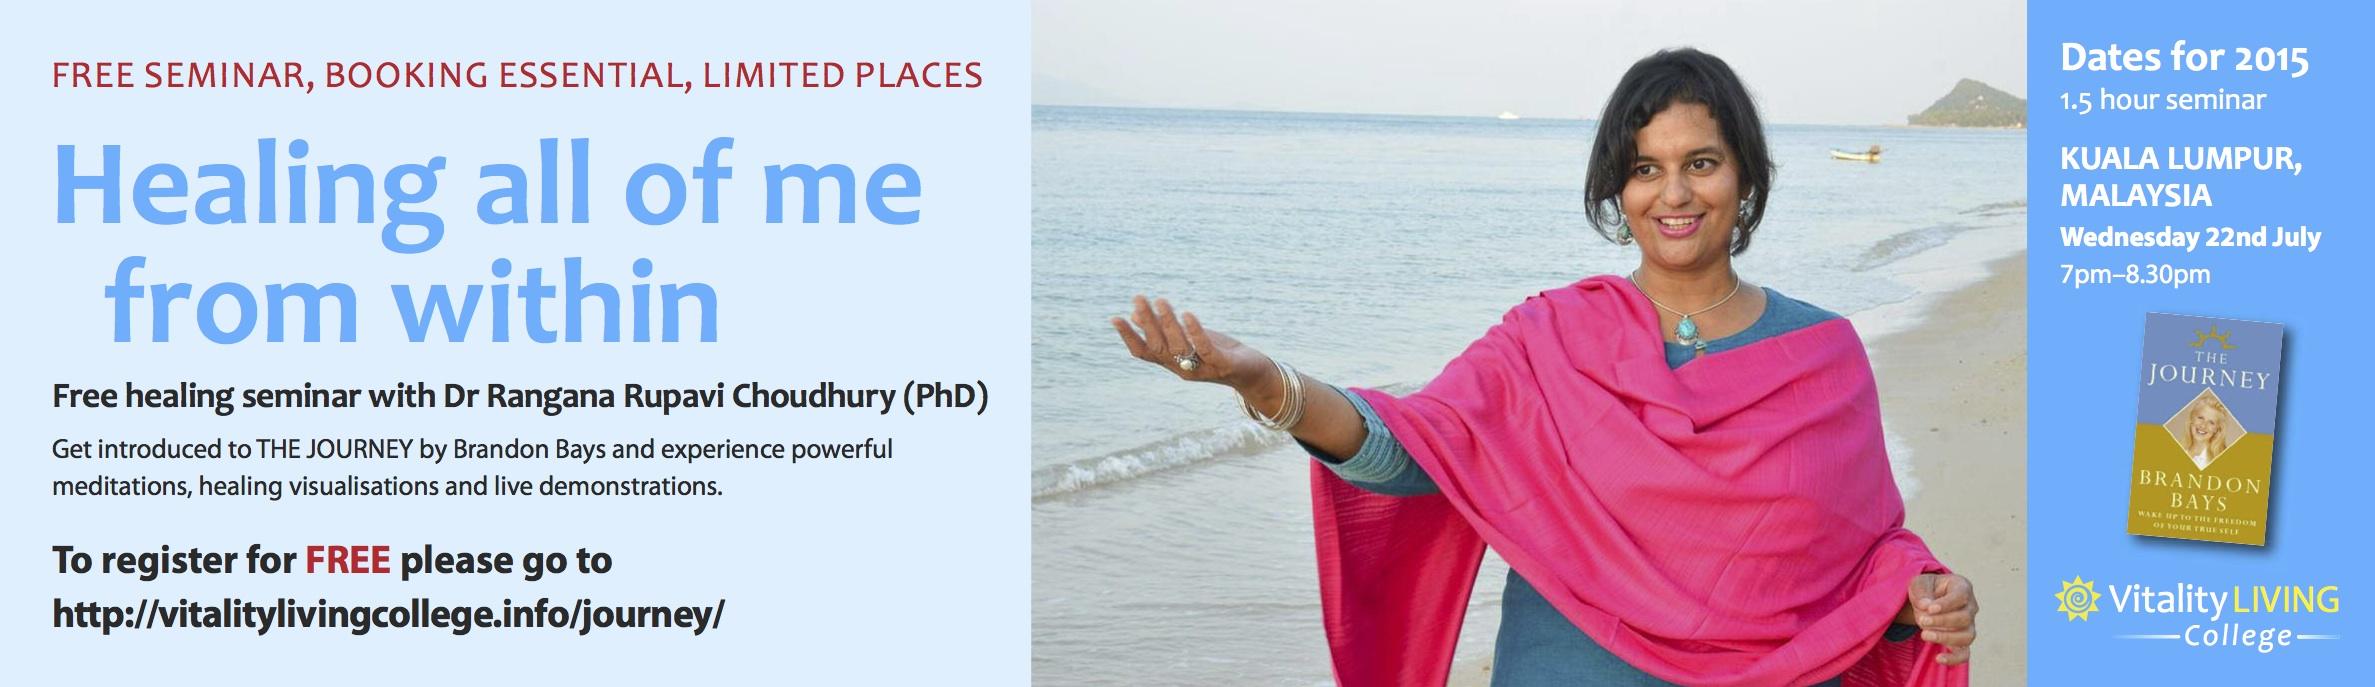 Free Healing Seminar KUALA LUMPUR with Dr Rangana Rupavi Choudhuri (PhD) Copy